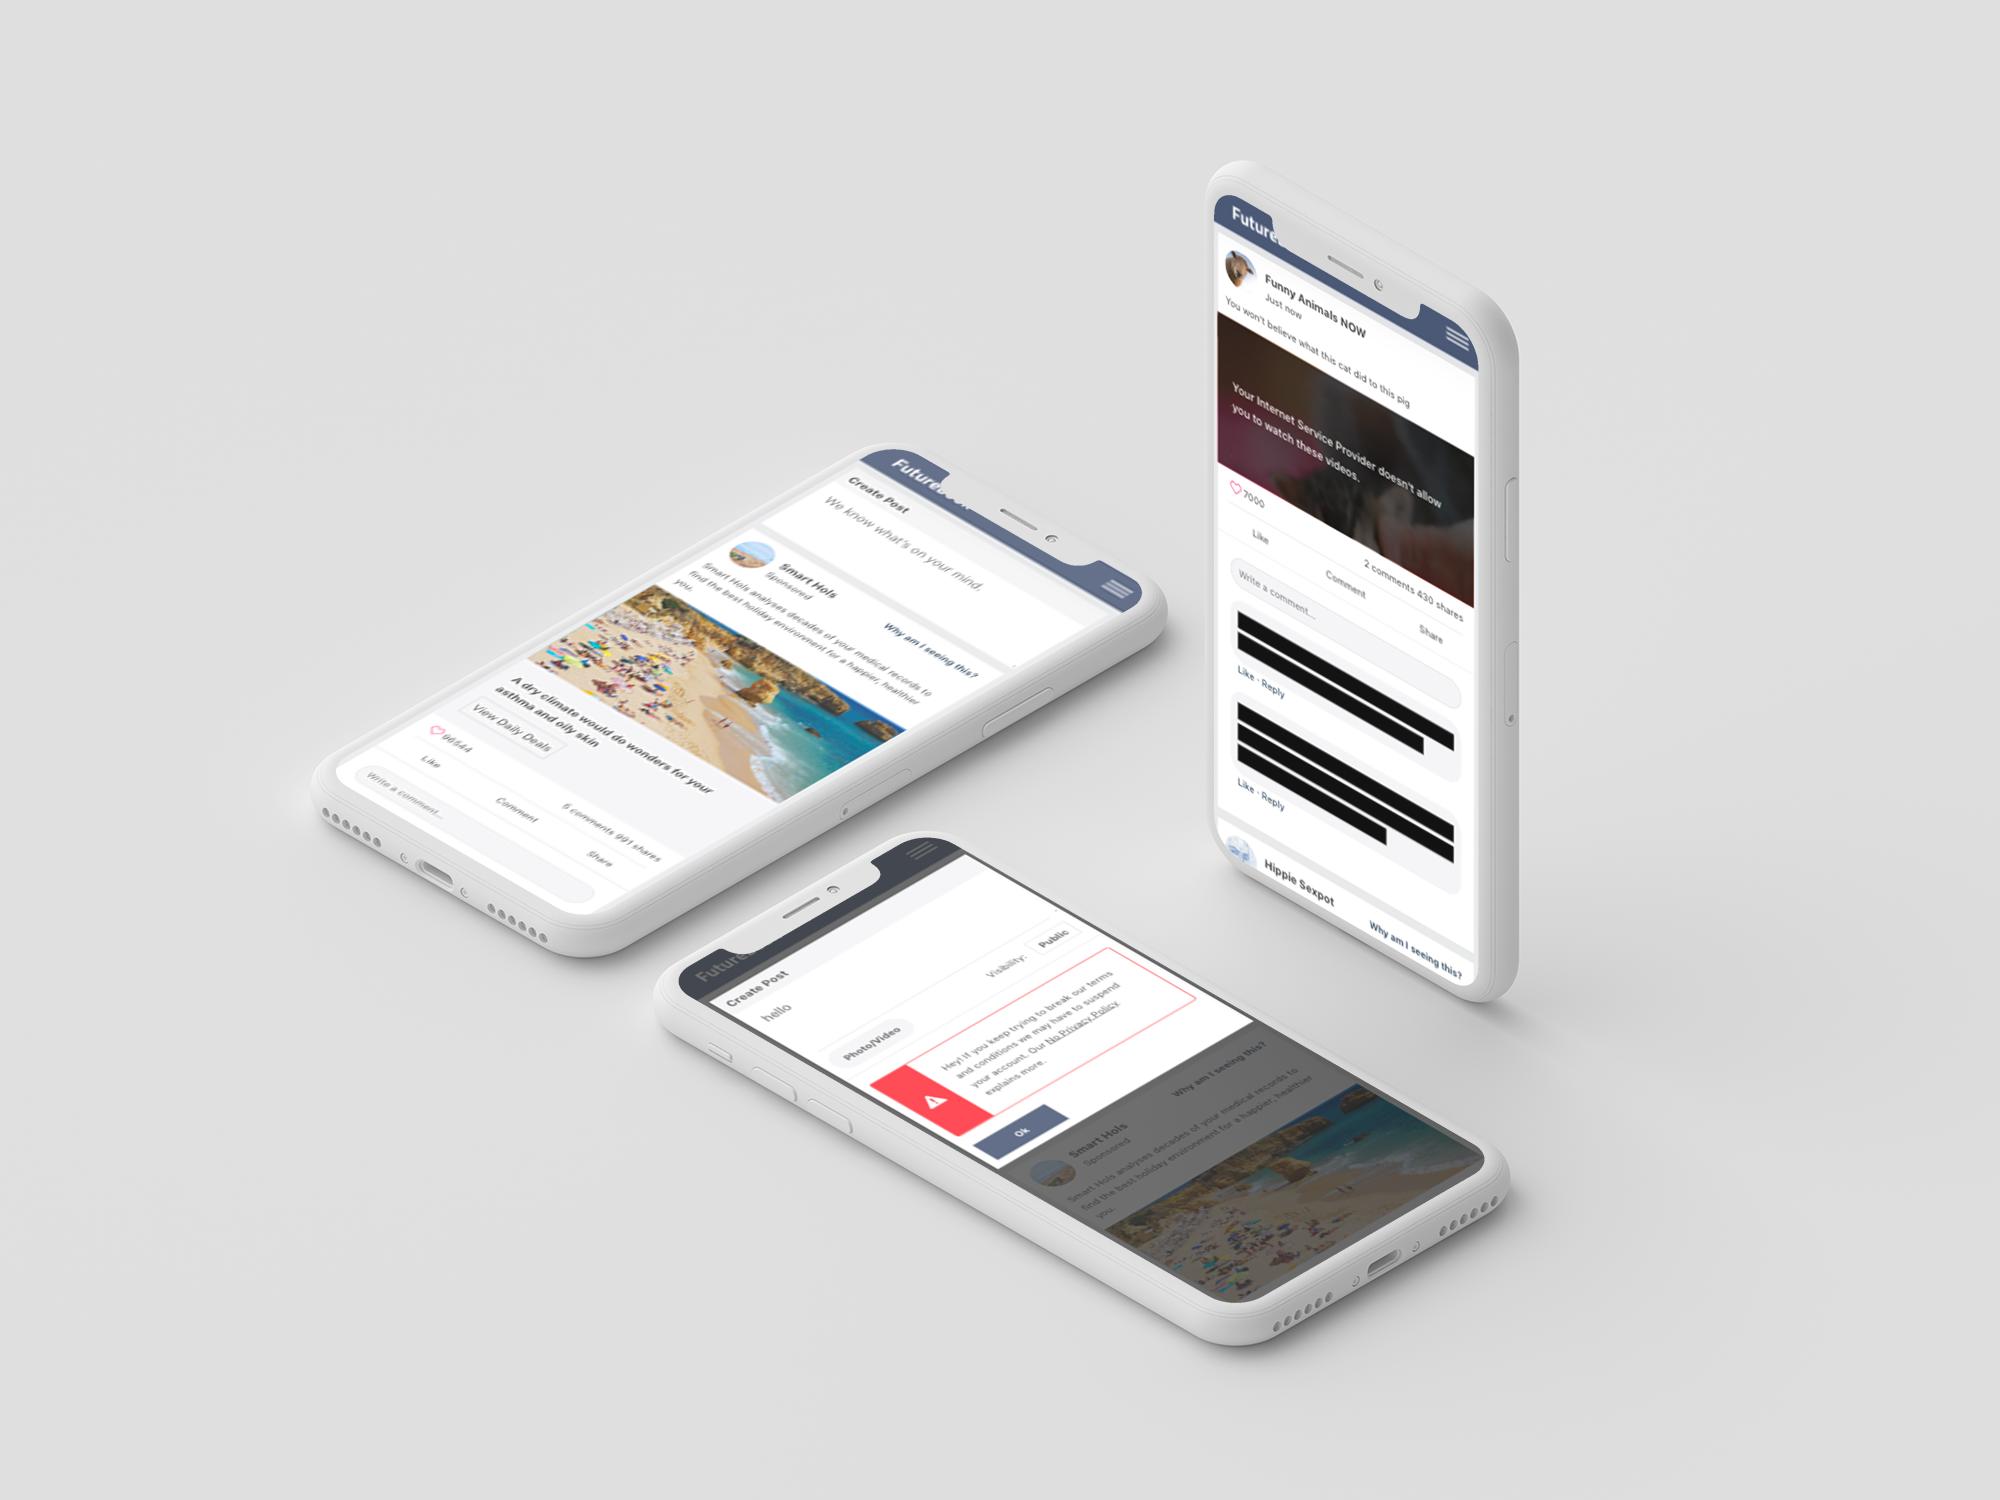 Different Futurebook screens on mobile